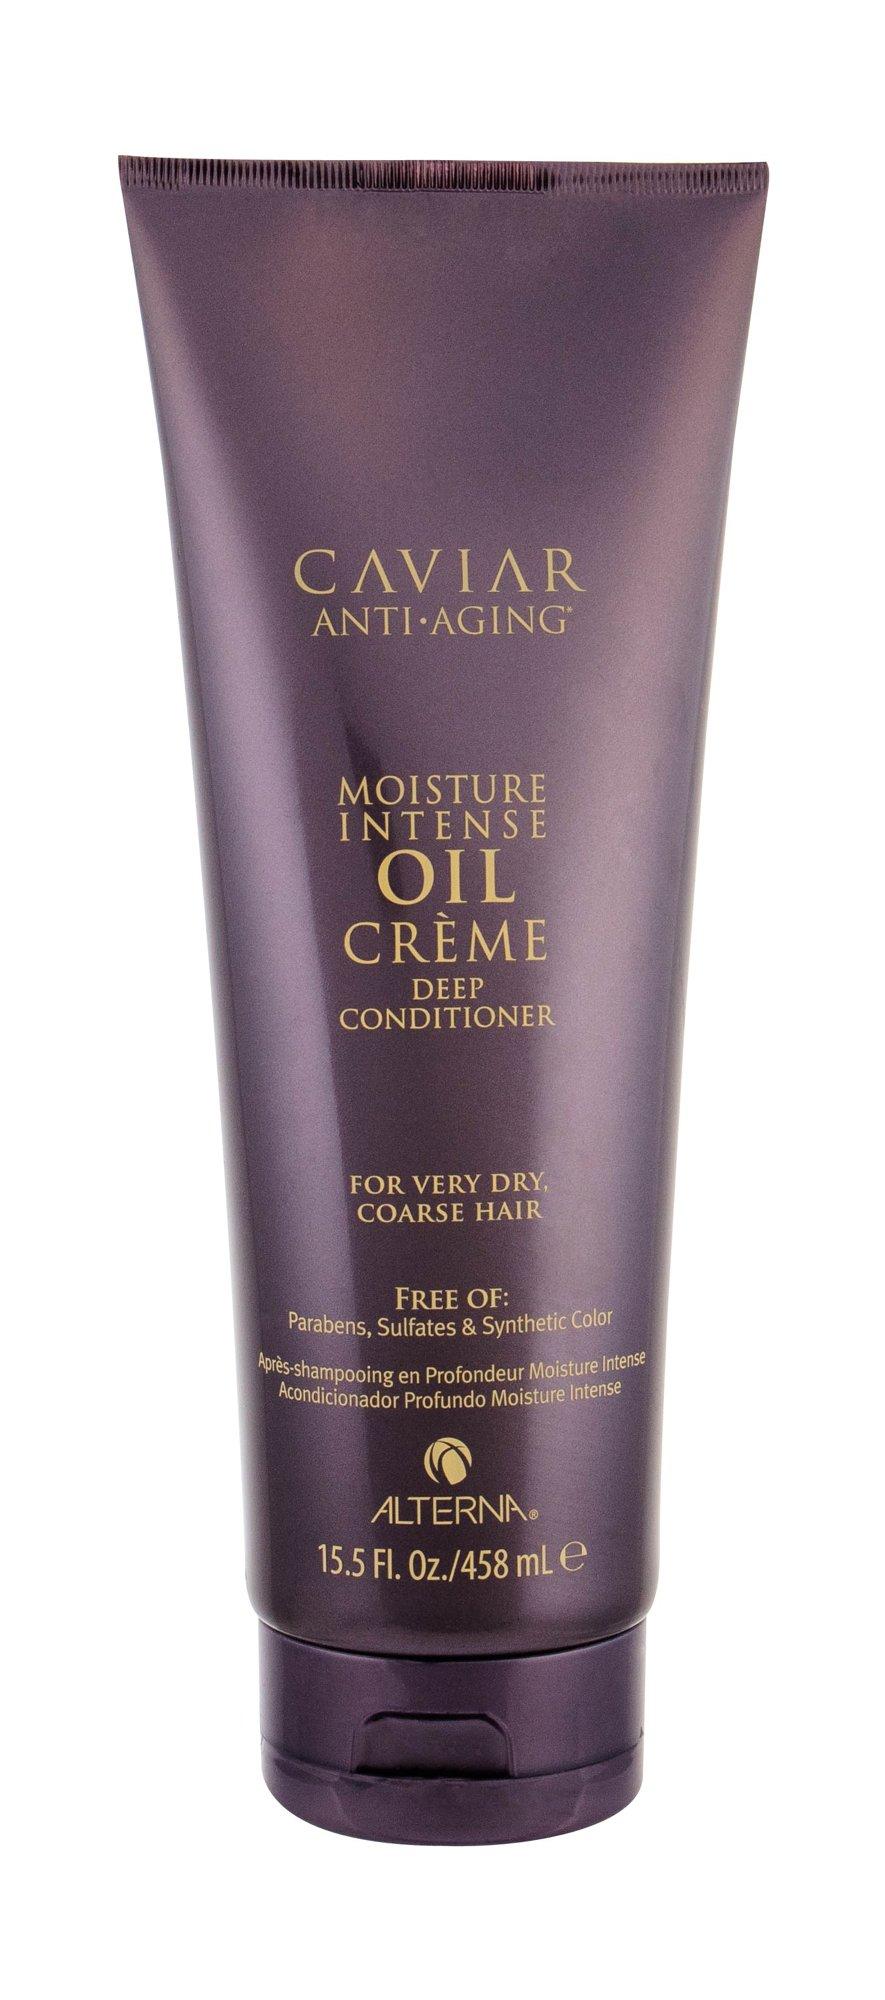 Alterna Caviar Anti-Aging Conditioner 458ml